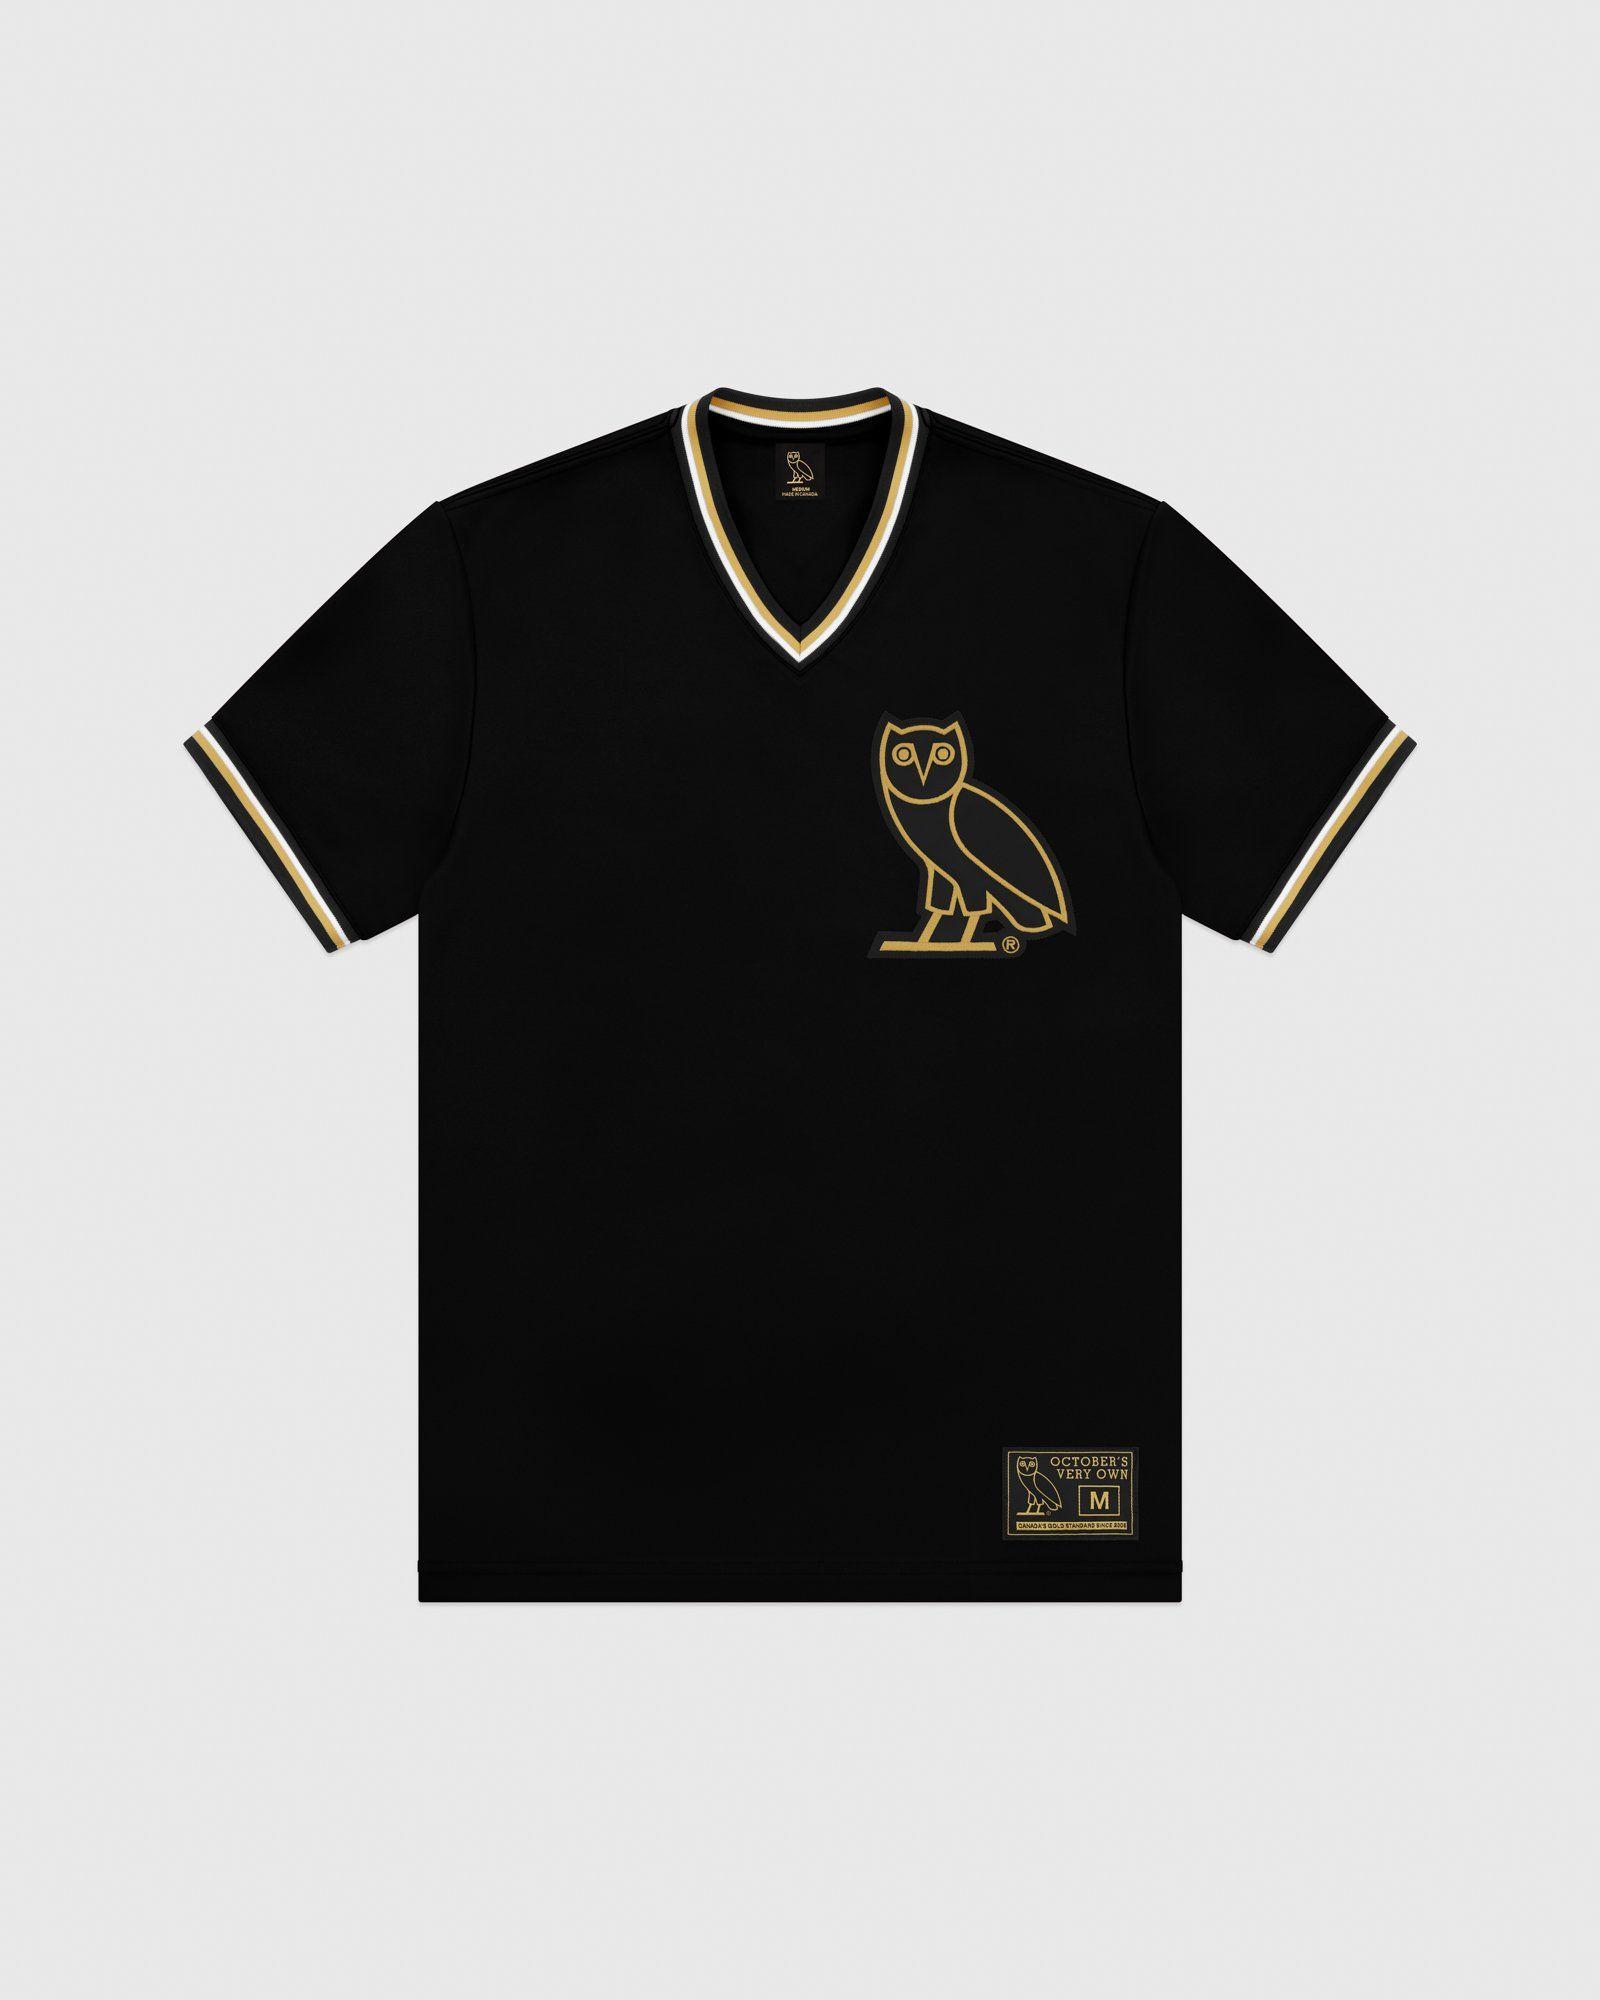 Ovo V Neck Baseball Jersey Black Mens Tops Baseball Jerseys Mens Tshirts